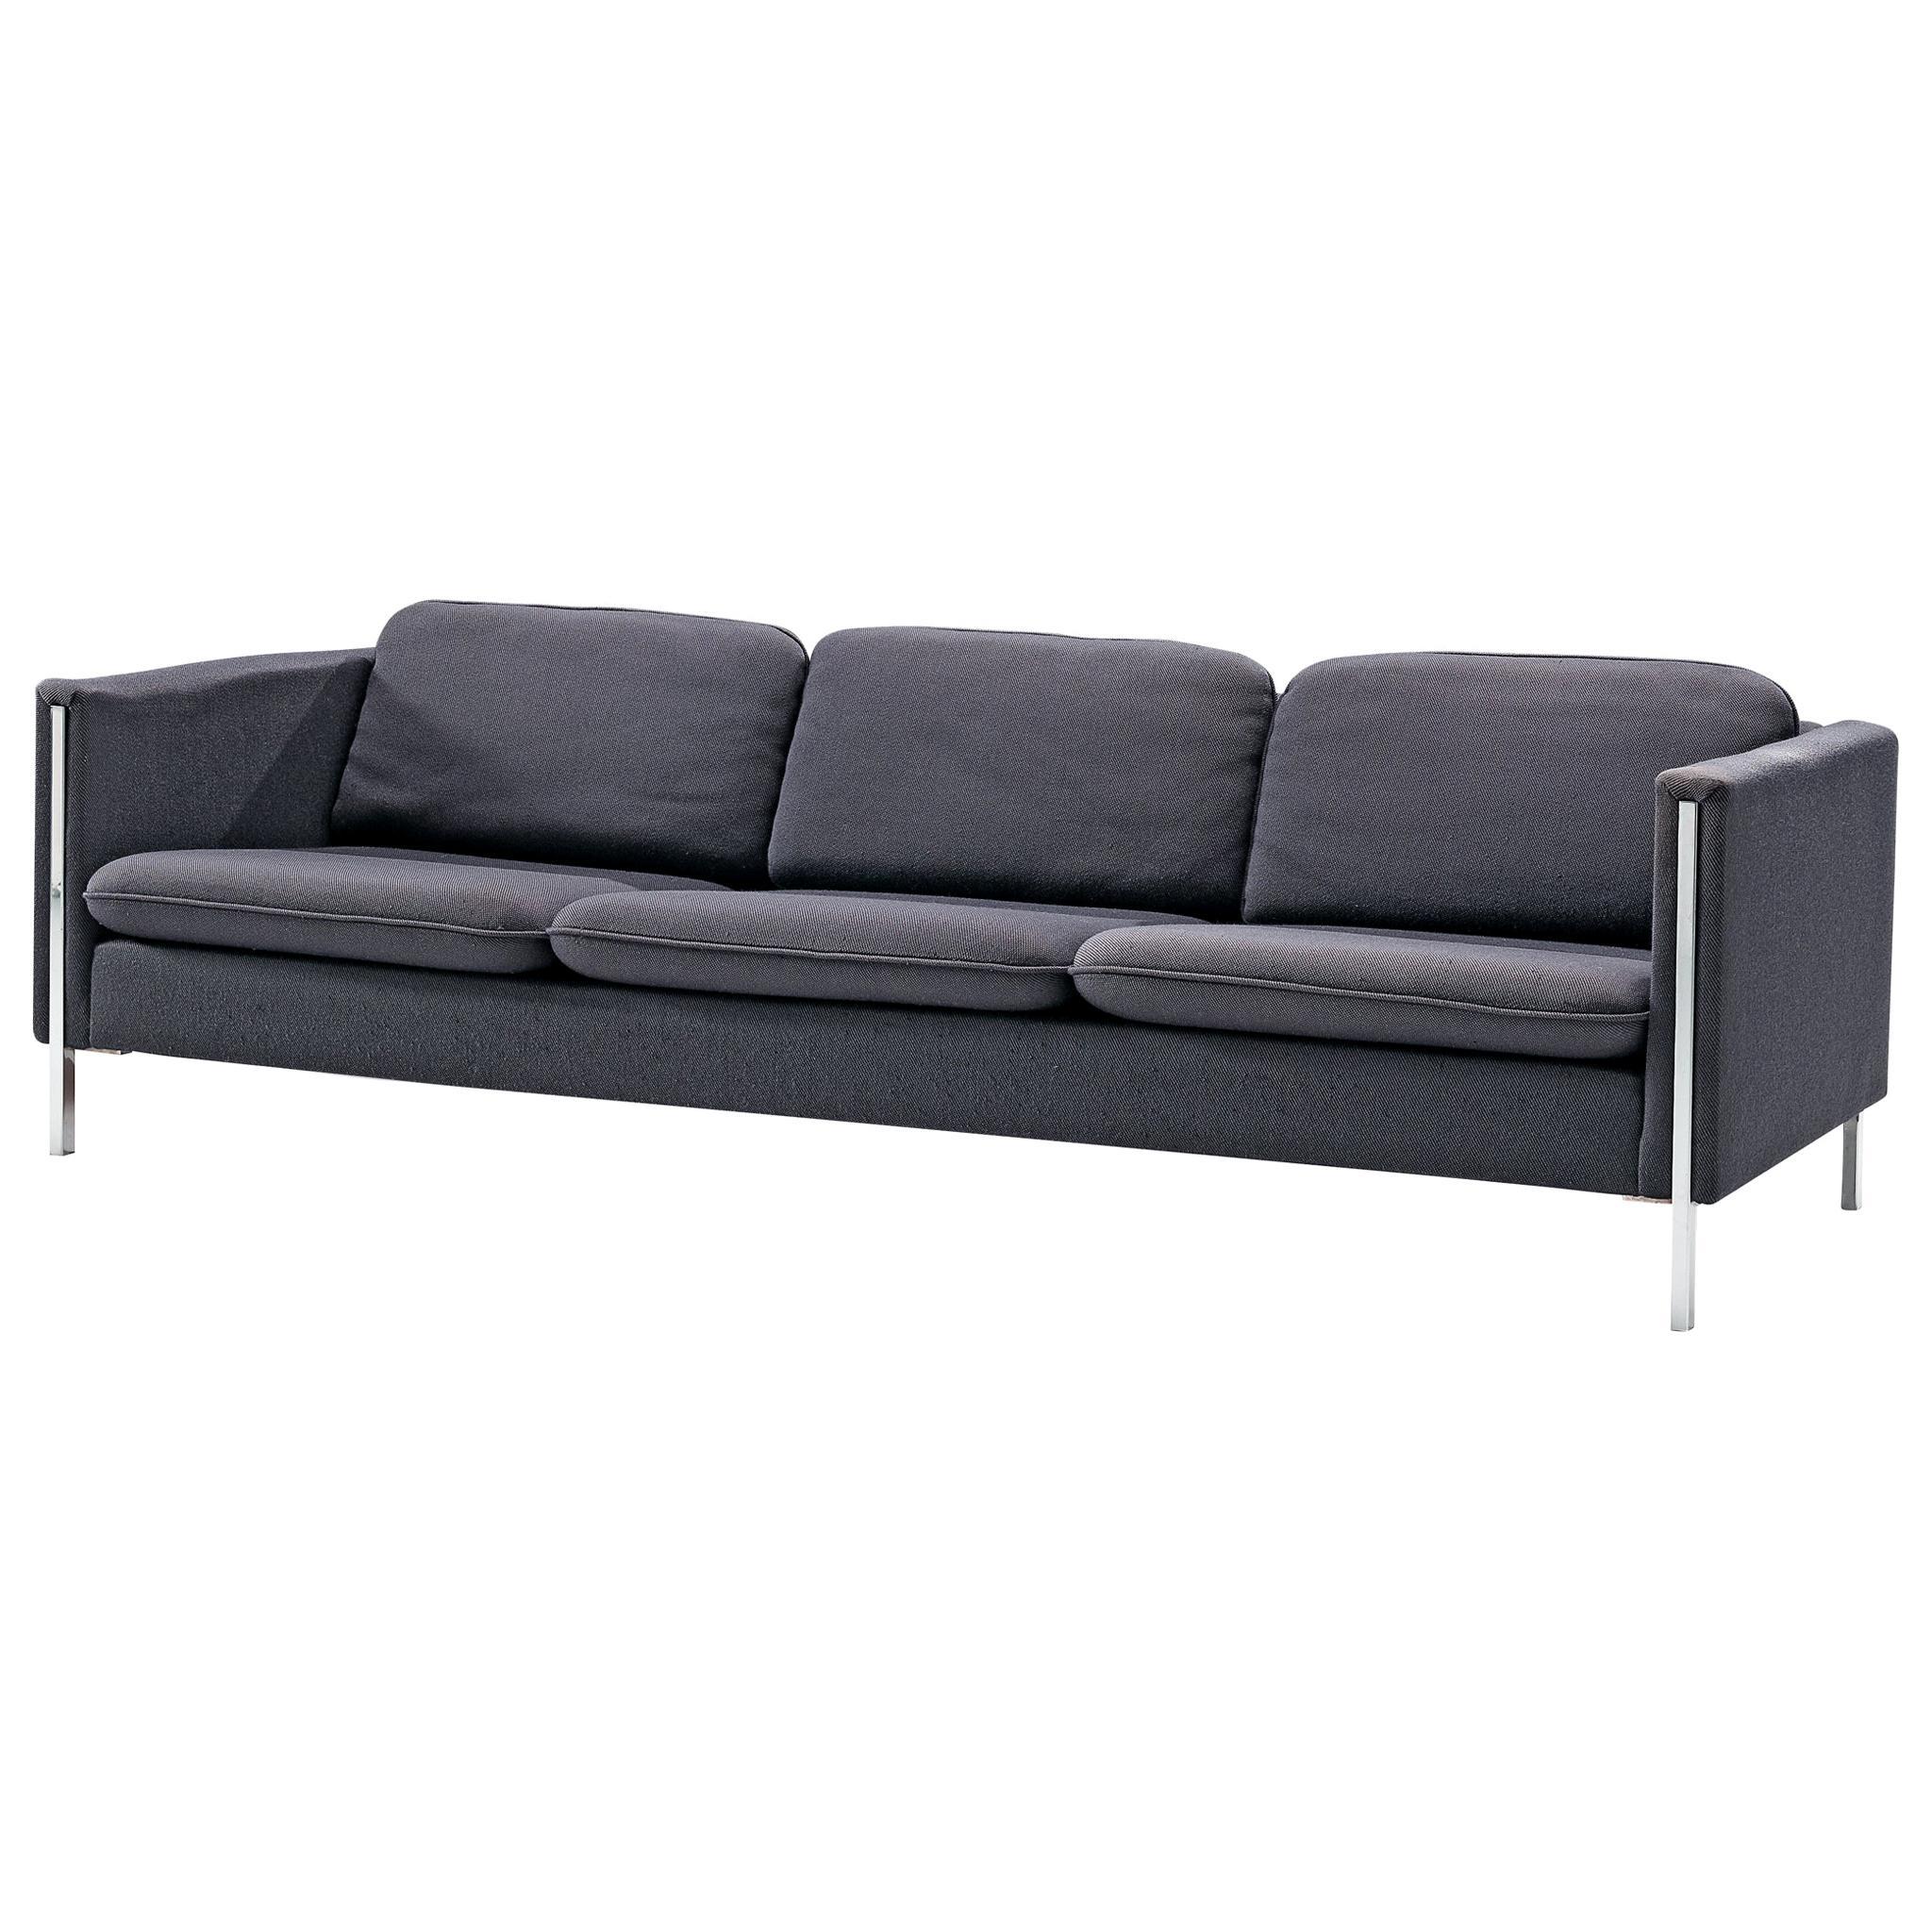 Pierre Paulin for Artifort Sofa '442/3' in Blue Upholstery